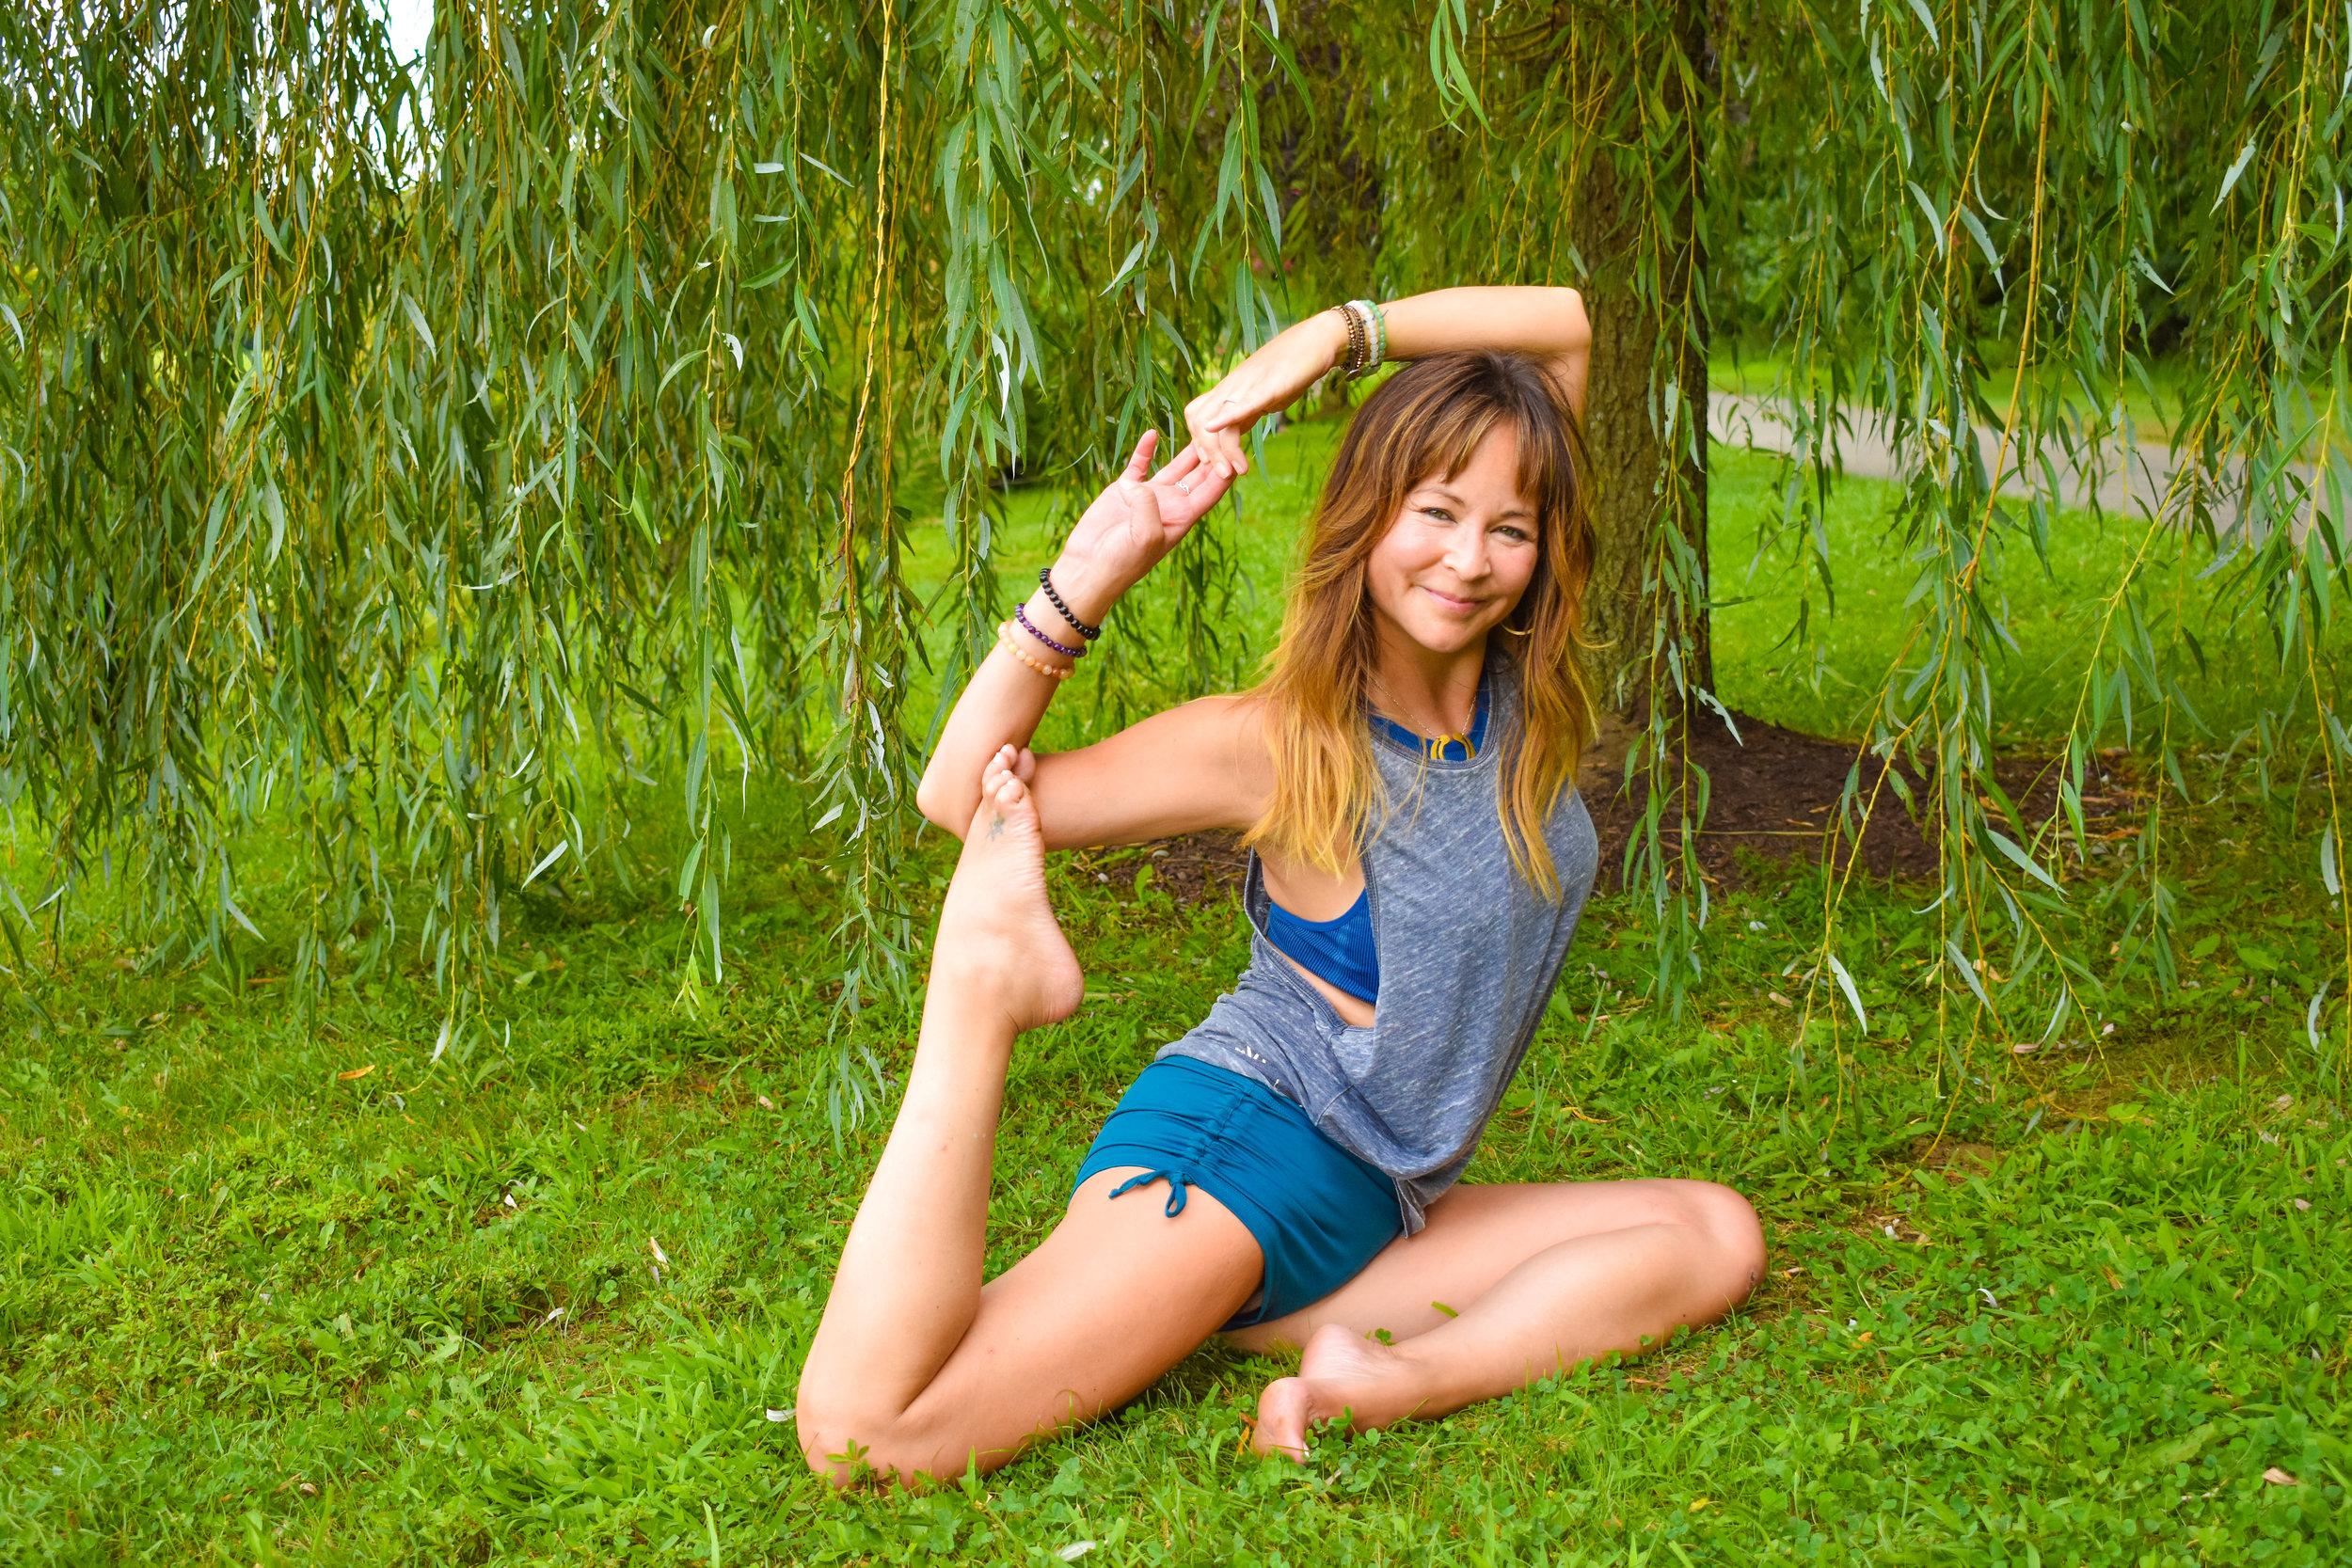 5:20pm to 6:20pm - Strala Yoga (Slow Flow) with Zoe Archer, Yoga House + Wellness Center